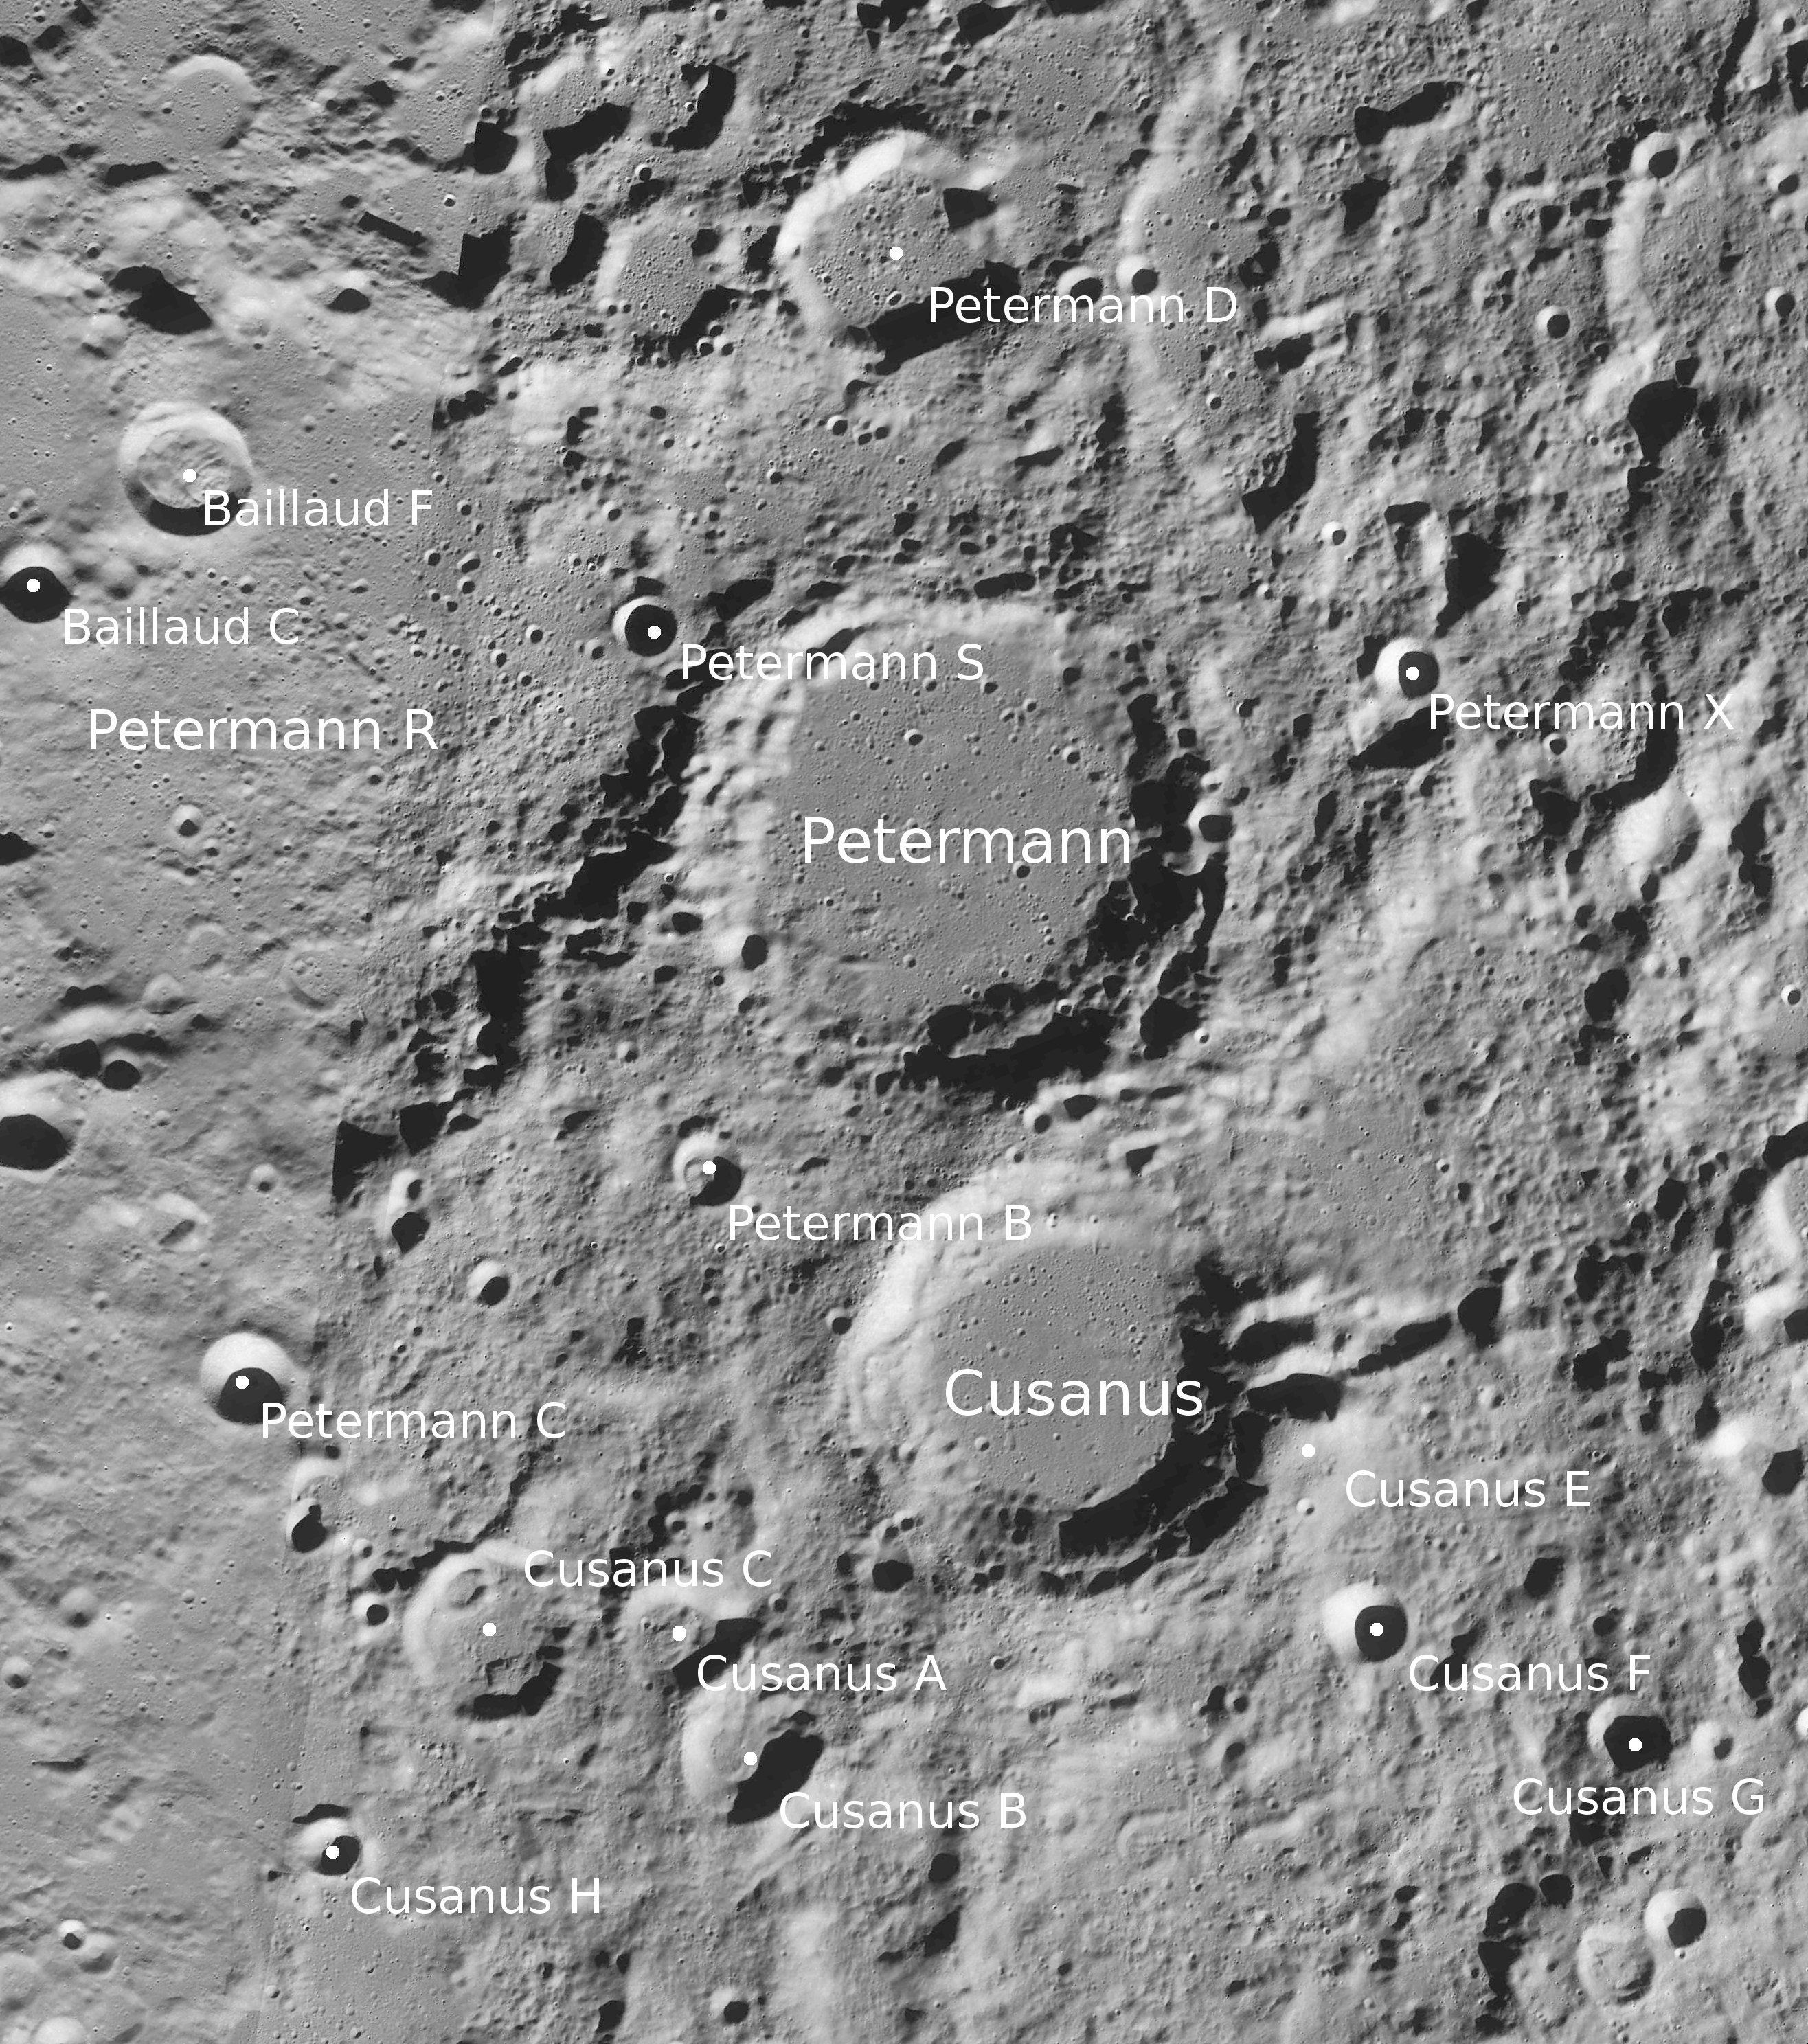 Petermann + Cusanus - LROC - WAC.JPG